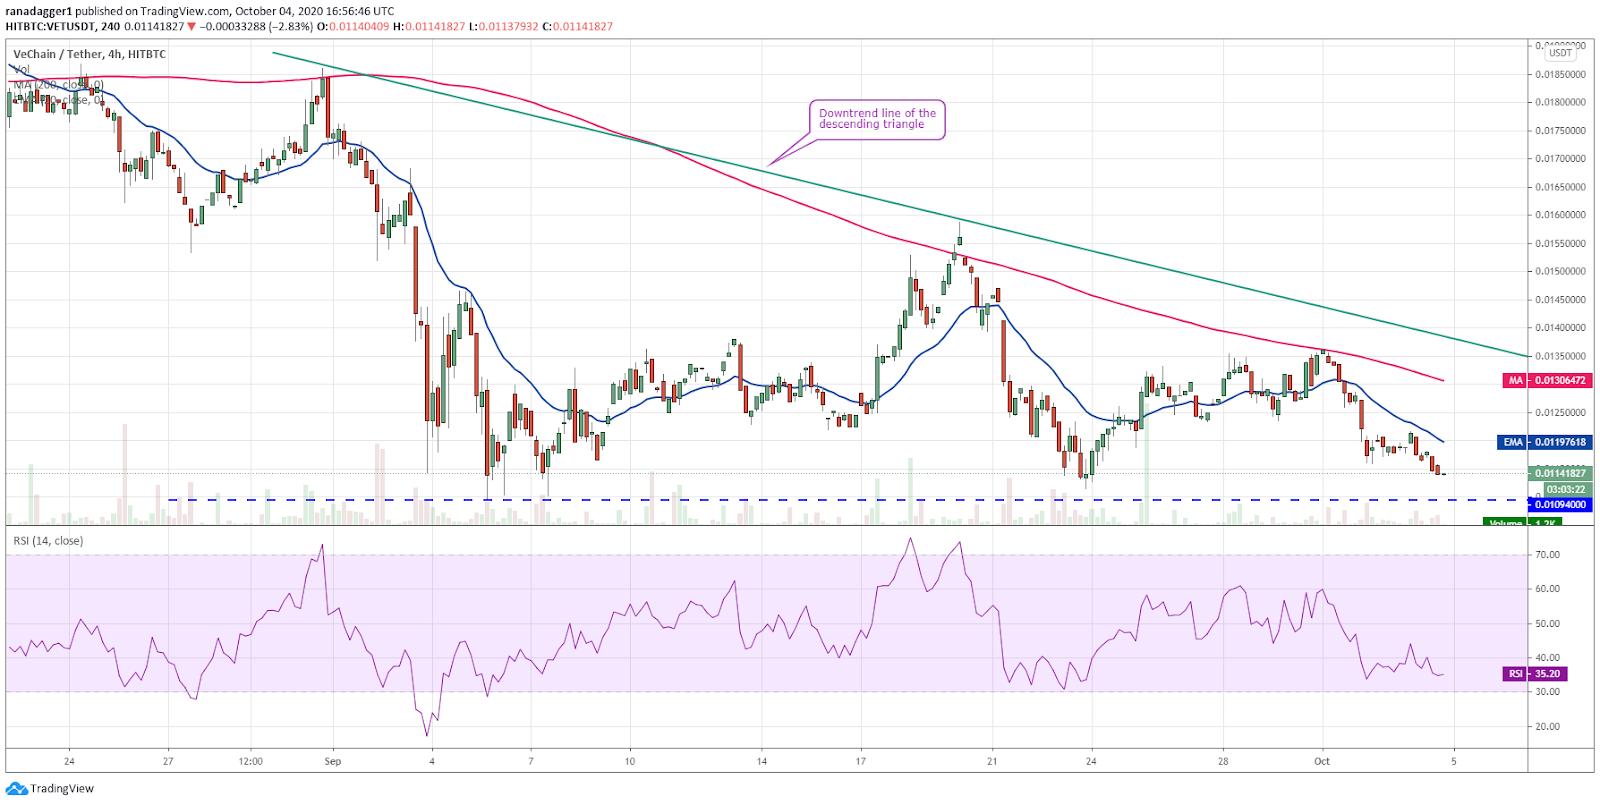 VET/USD 4-hour chart. Source: TradingView